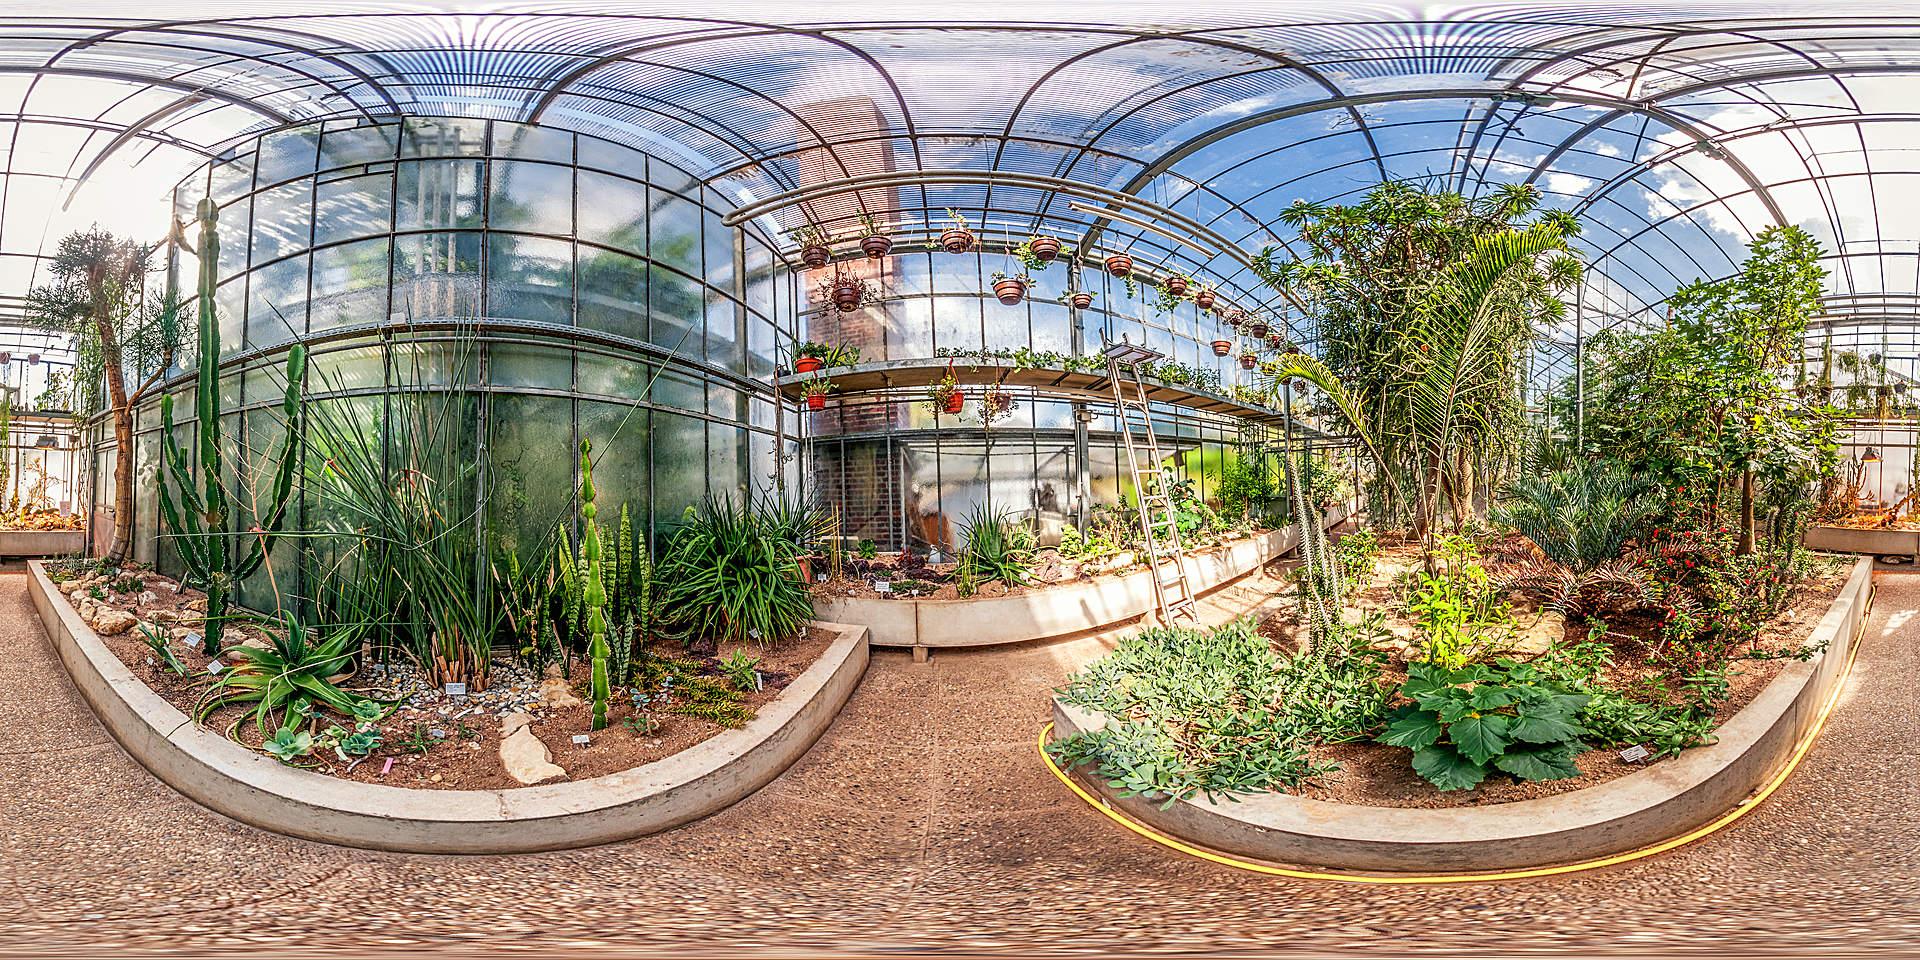 Botanischer Garten Darmstadt - Sukkulentenhaus